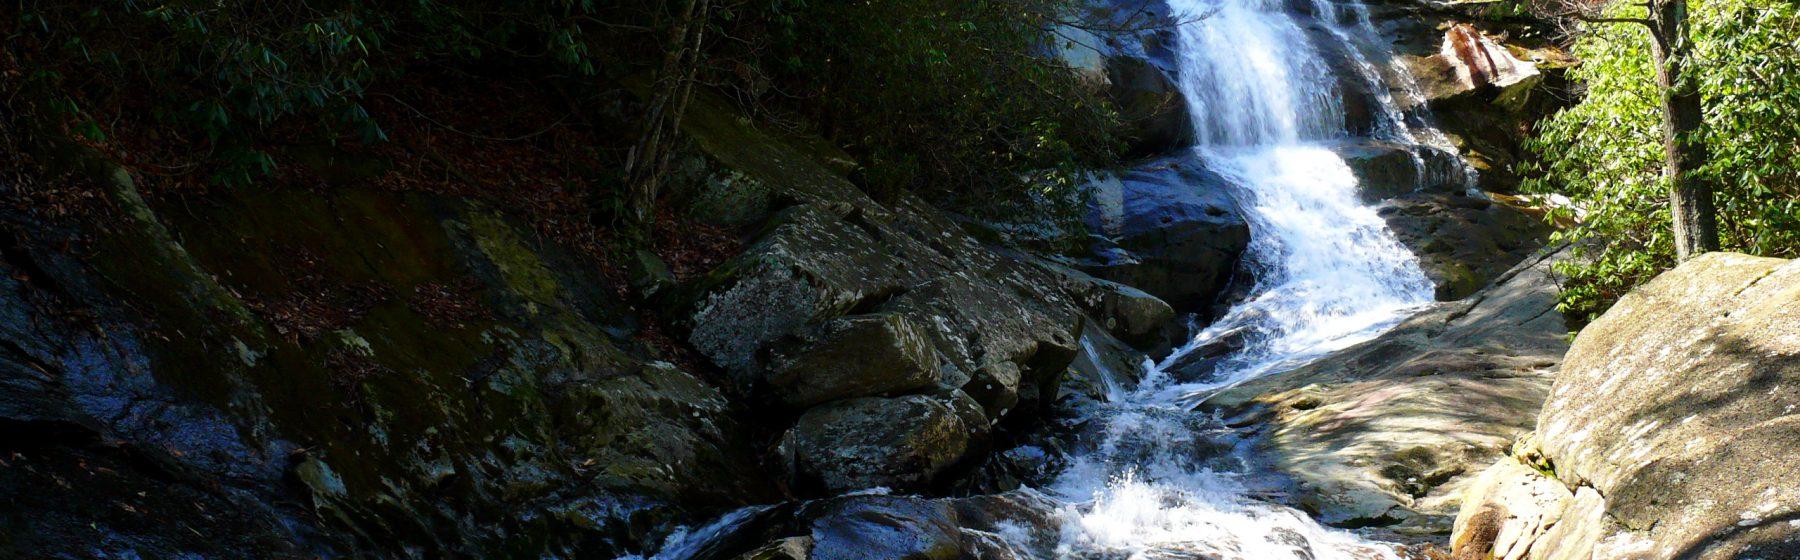 North Carolina mountain creek